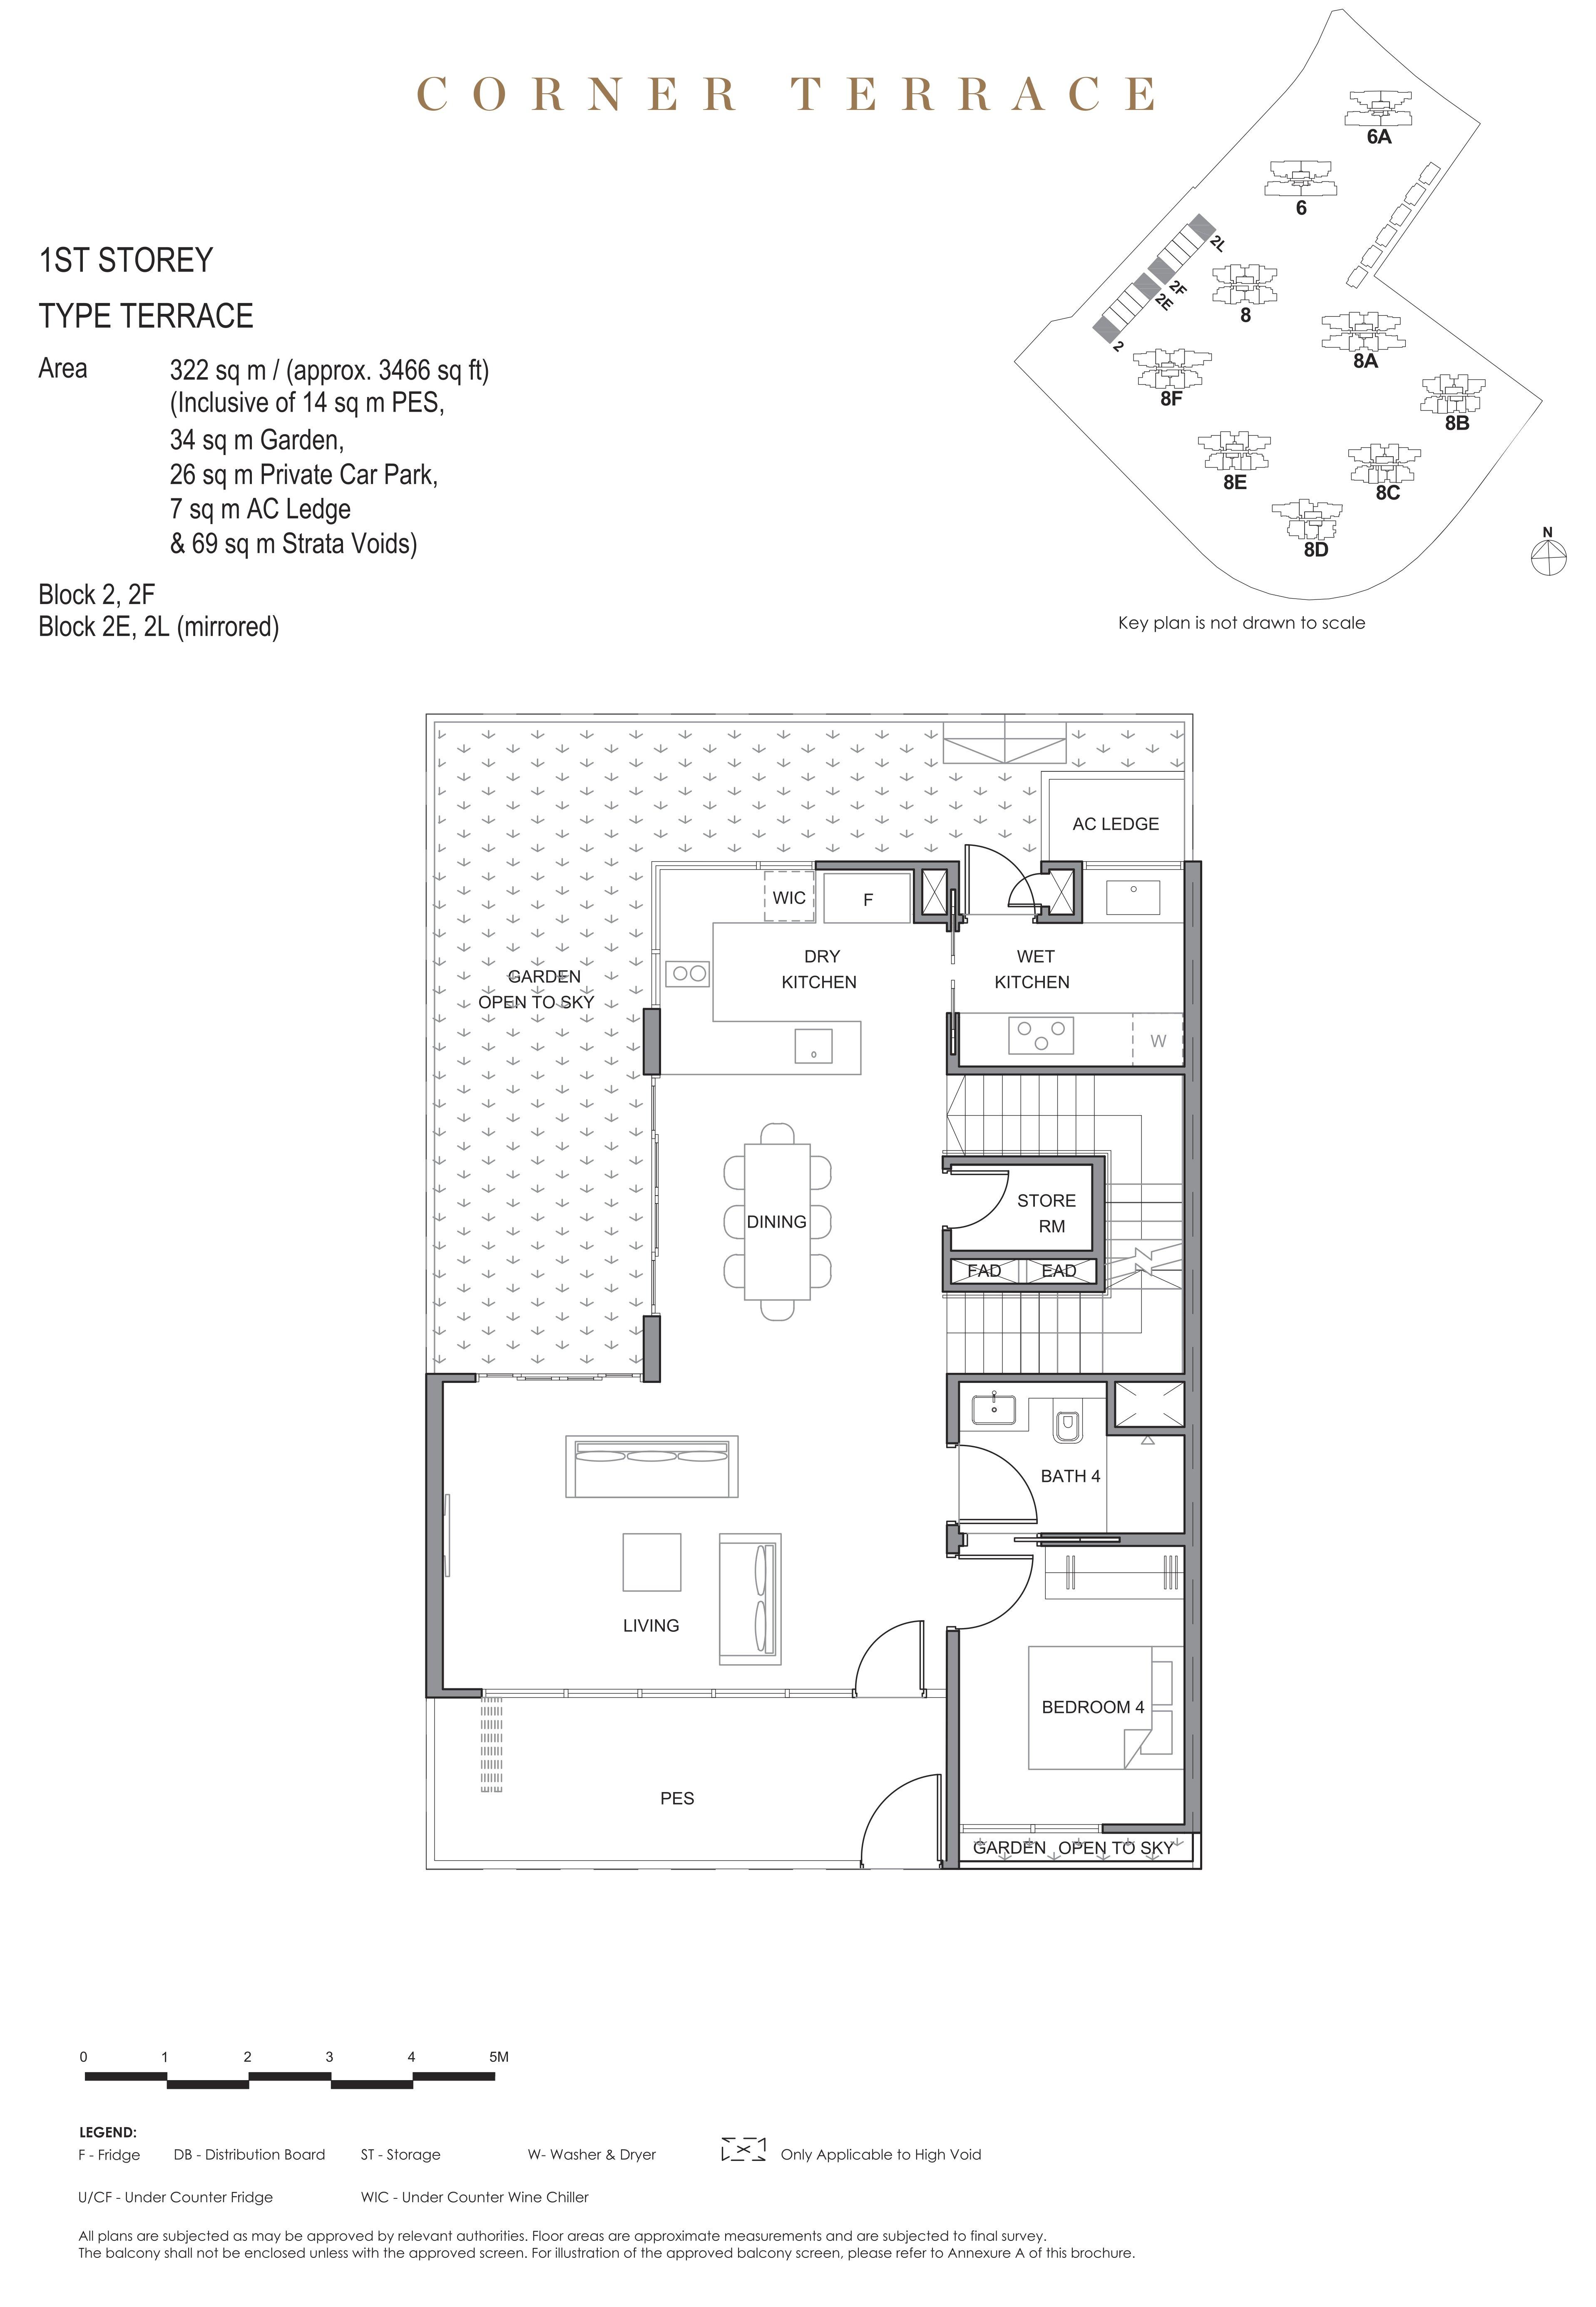 Parc Clematis 锦泰门第 masterpiece corner terrace 1st storey